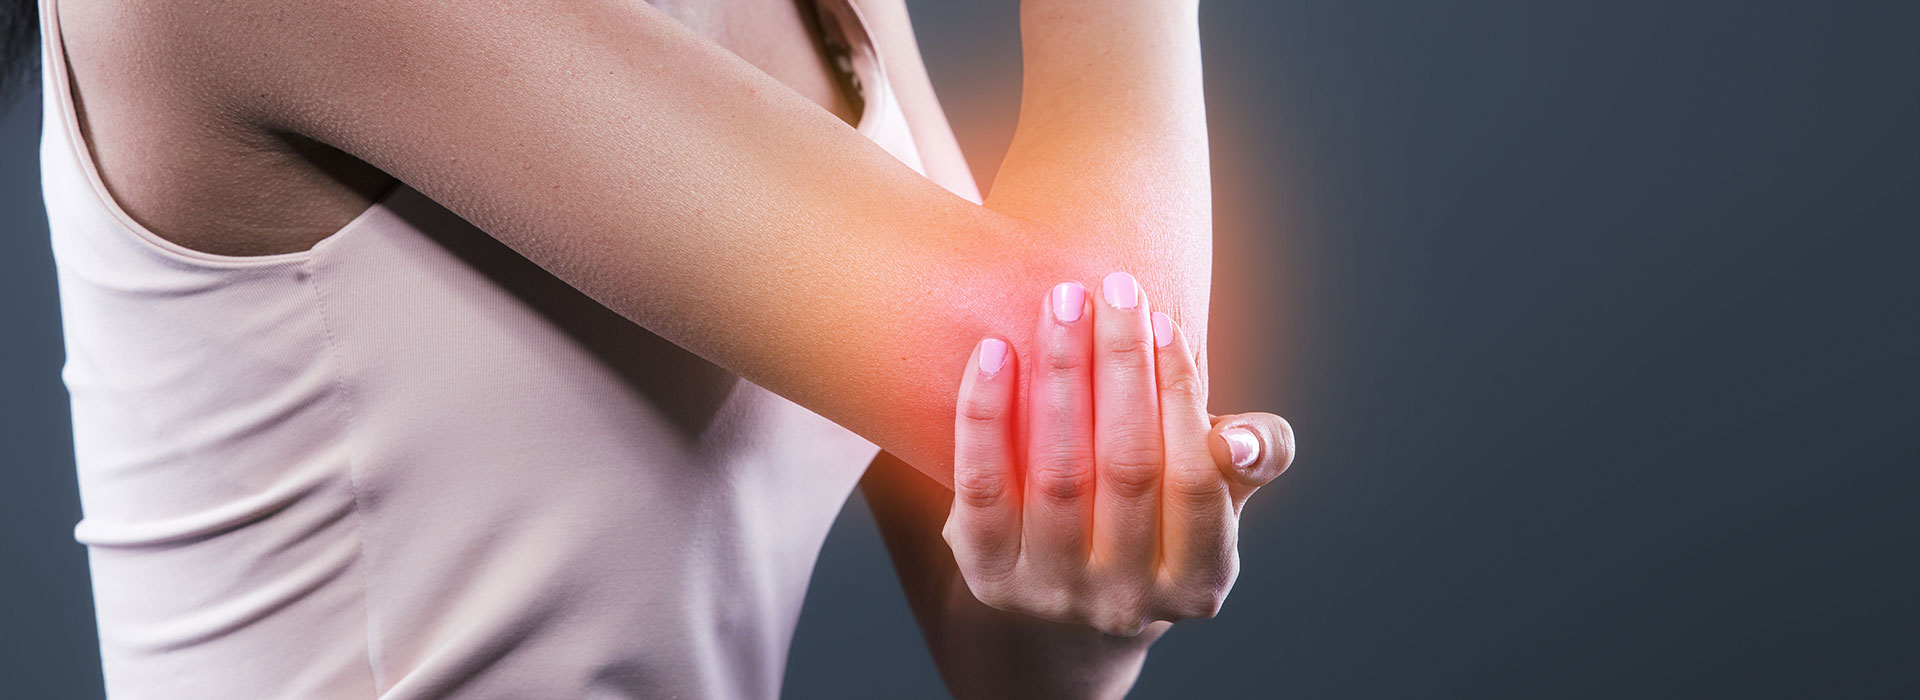 Elbow Surgery In Iran